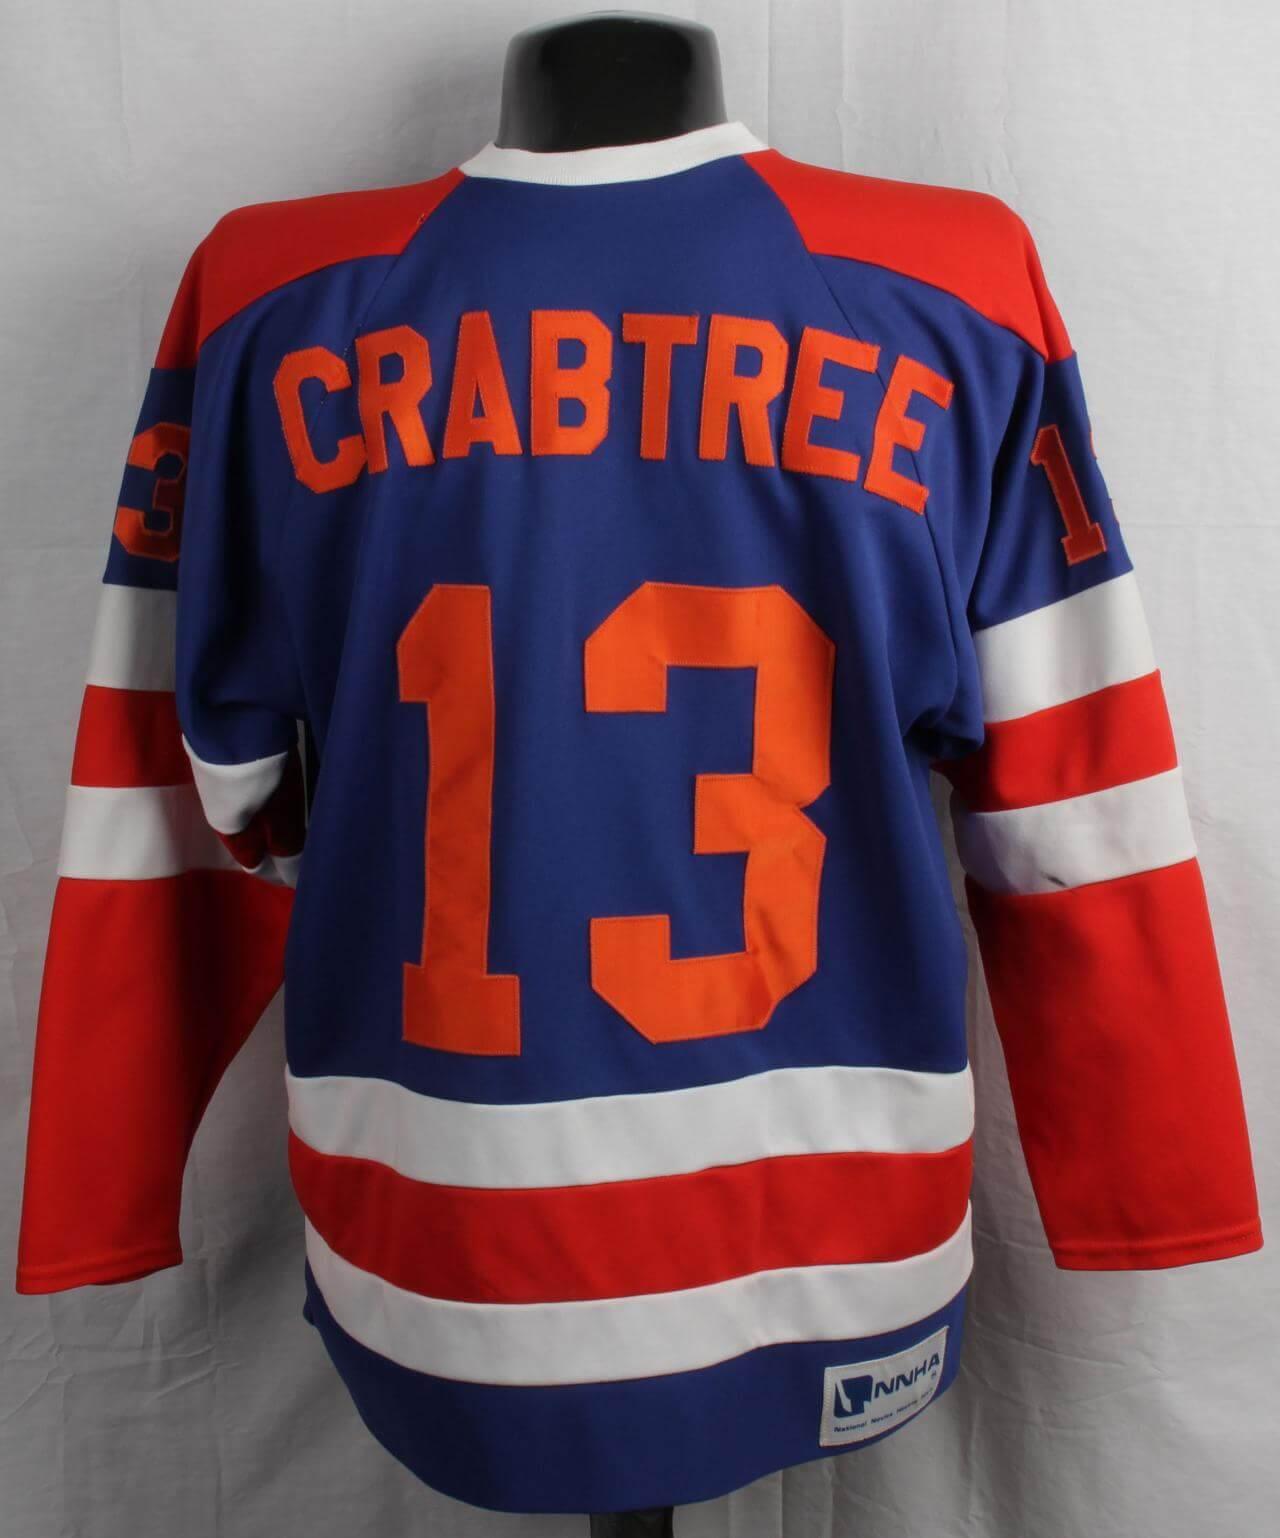 Crabtree Game-Worn/Used NNHA Hockey Jersey